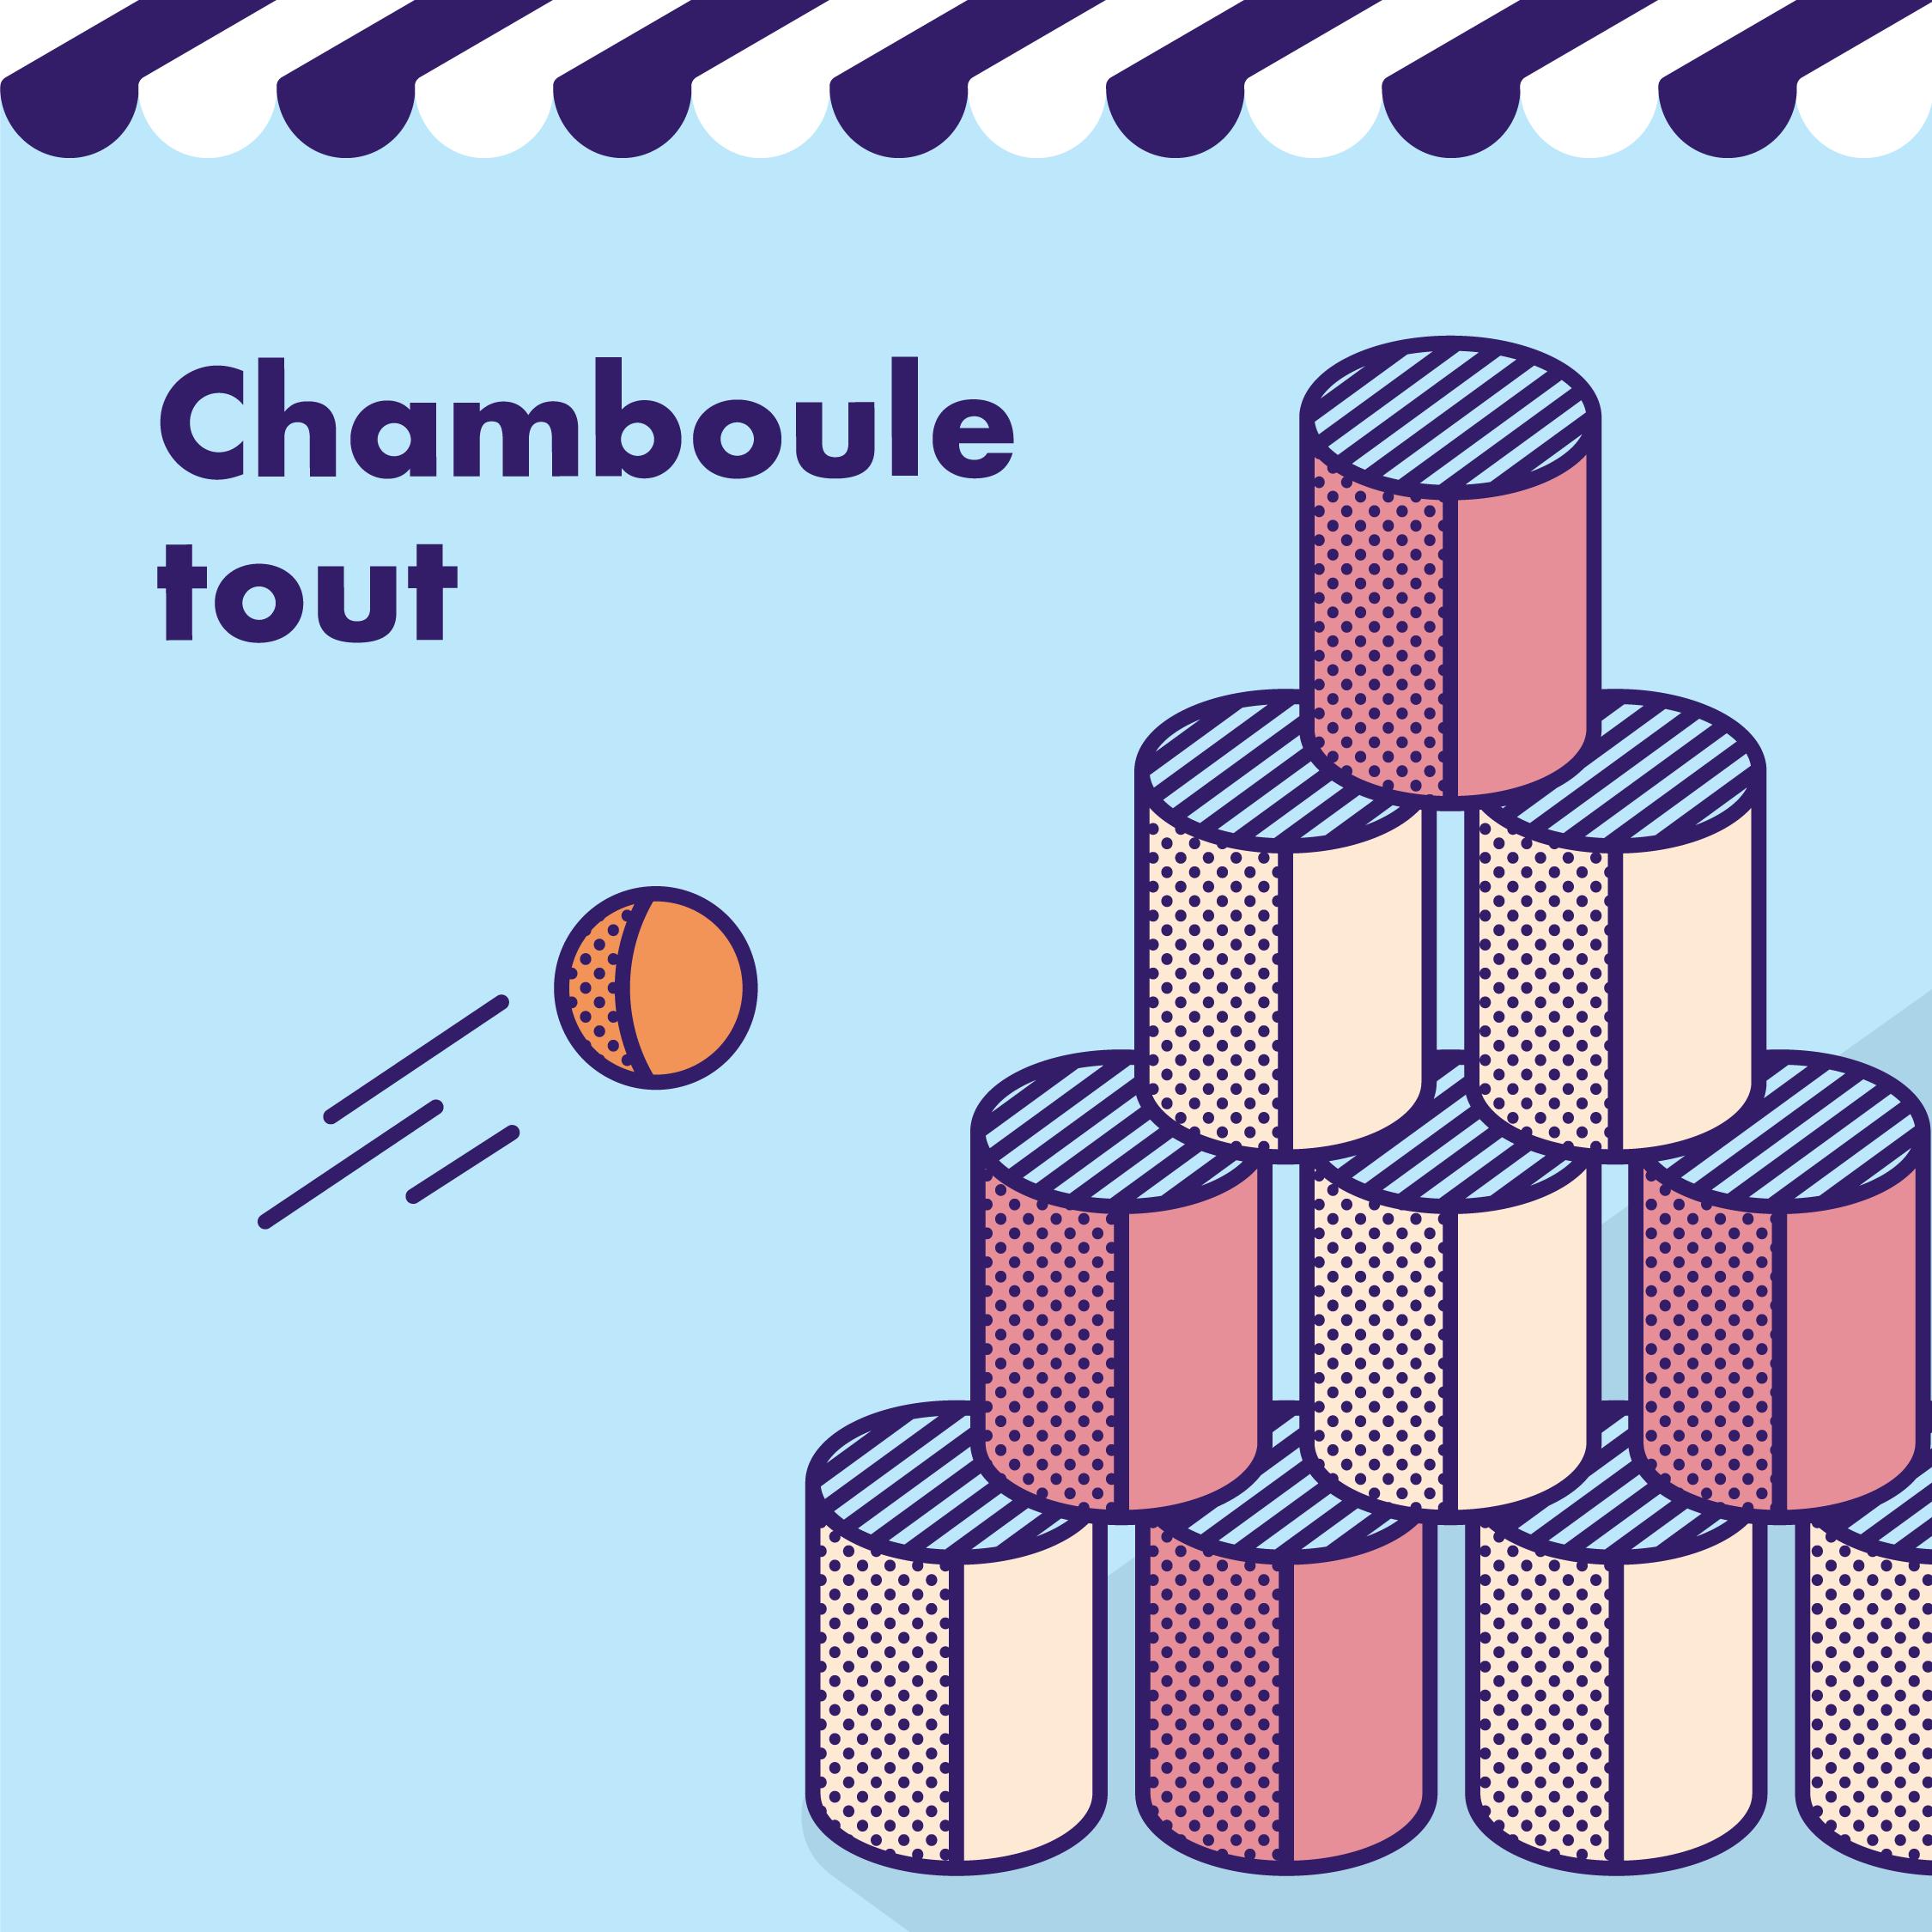 Visuel Chamboule tout_Plan de travail 1